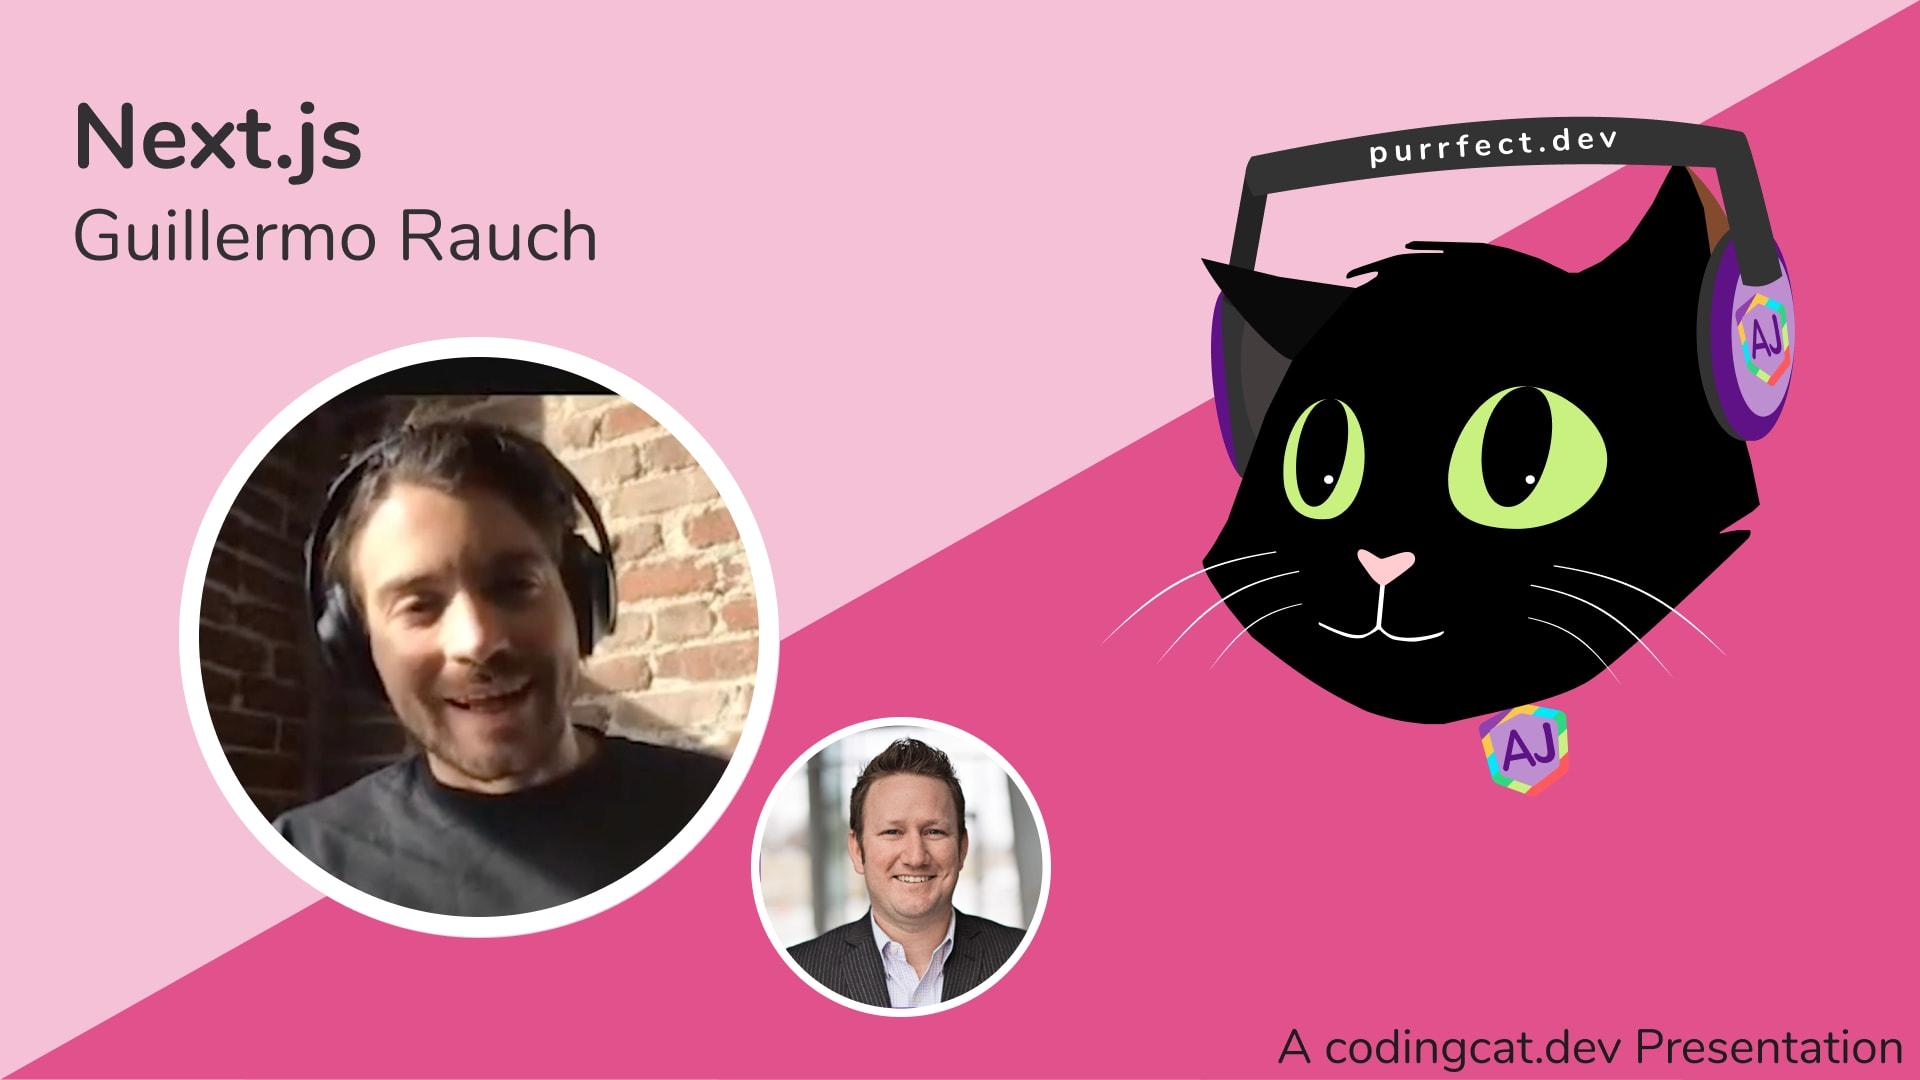 0.6 - NextJS with Guillermo Rauch